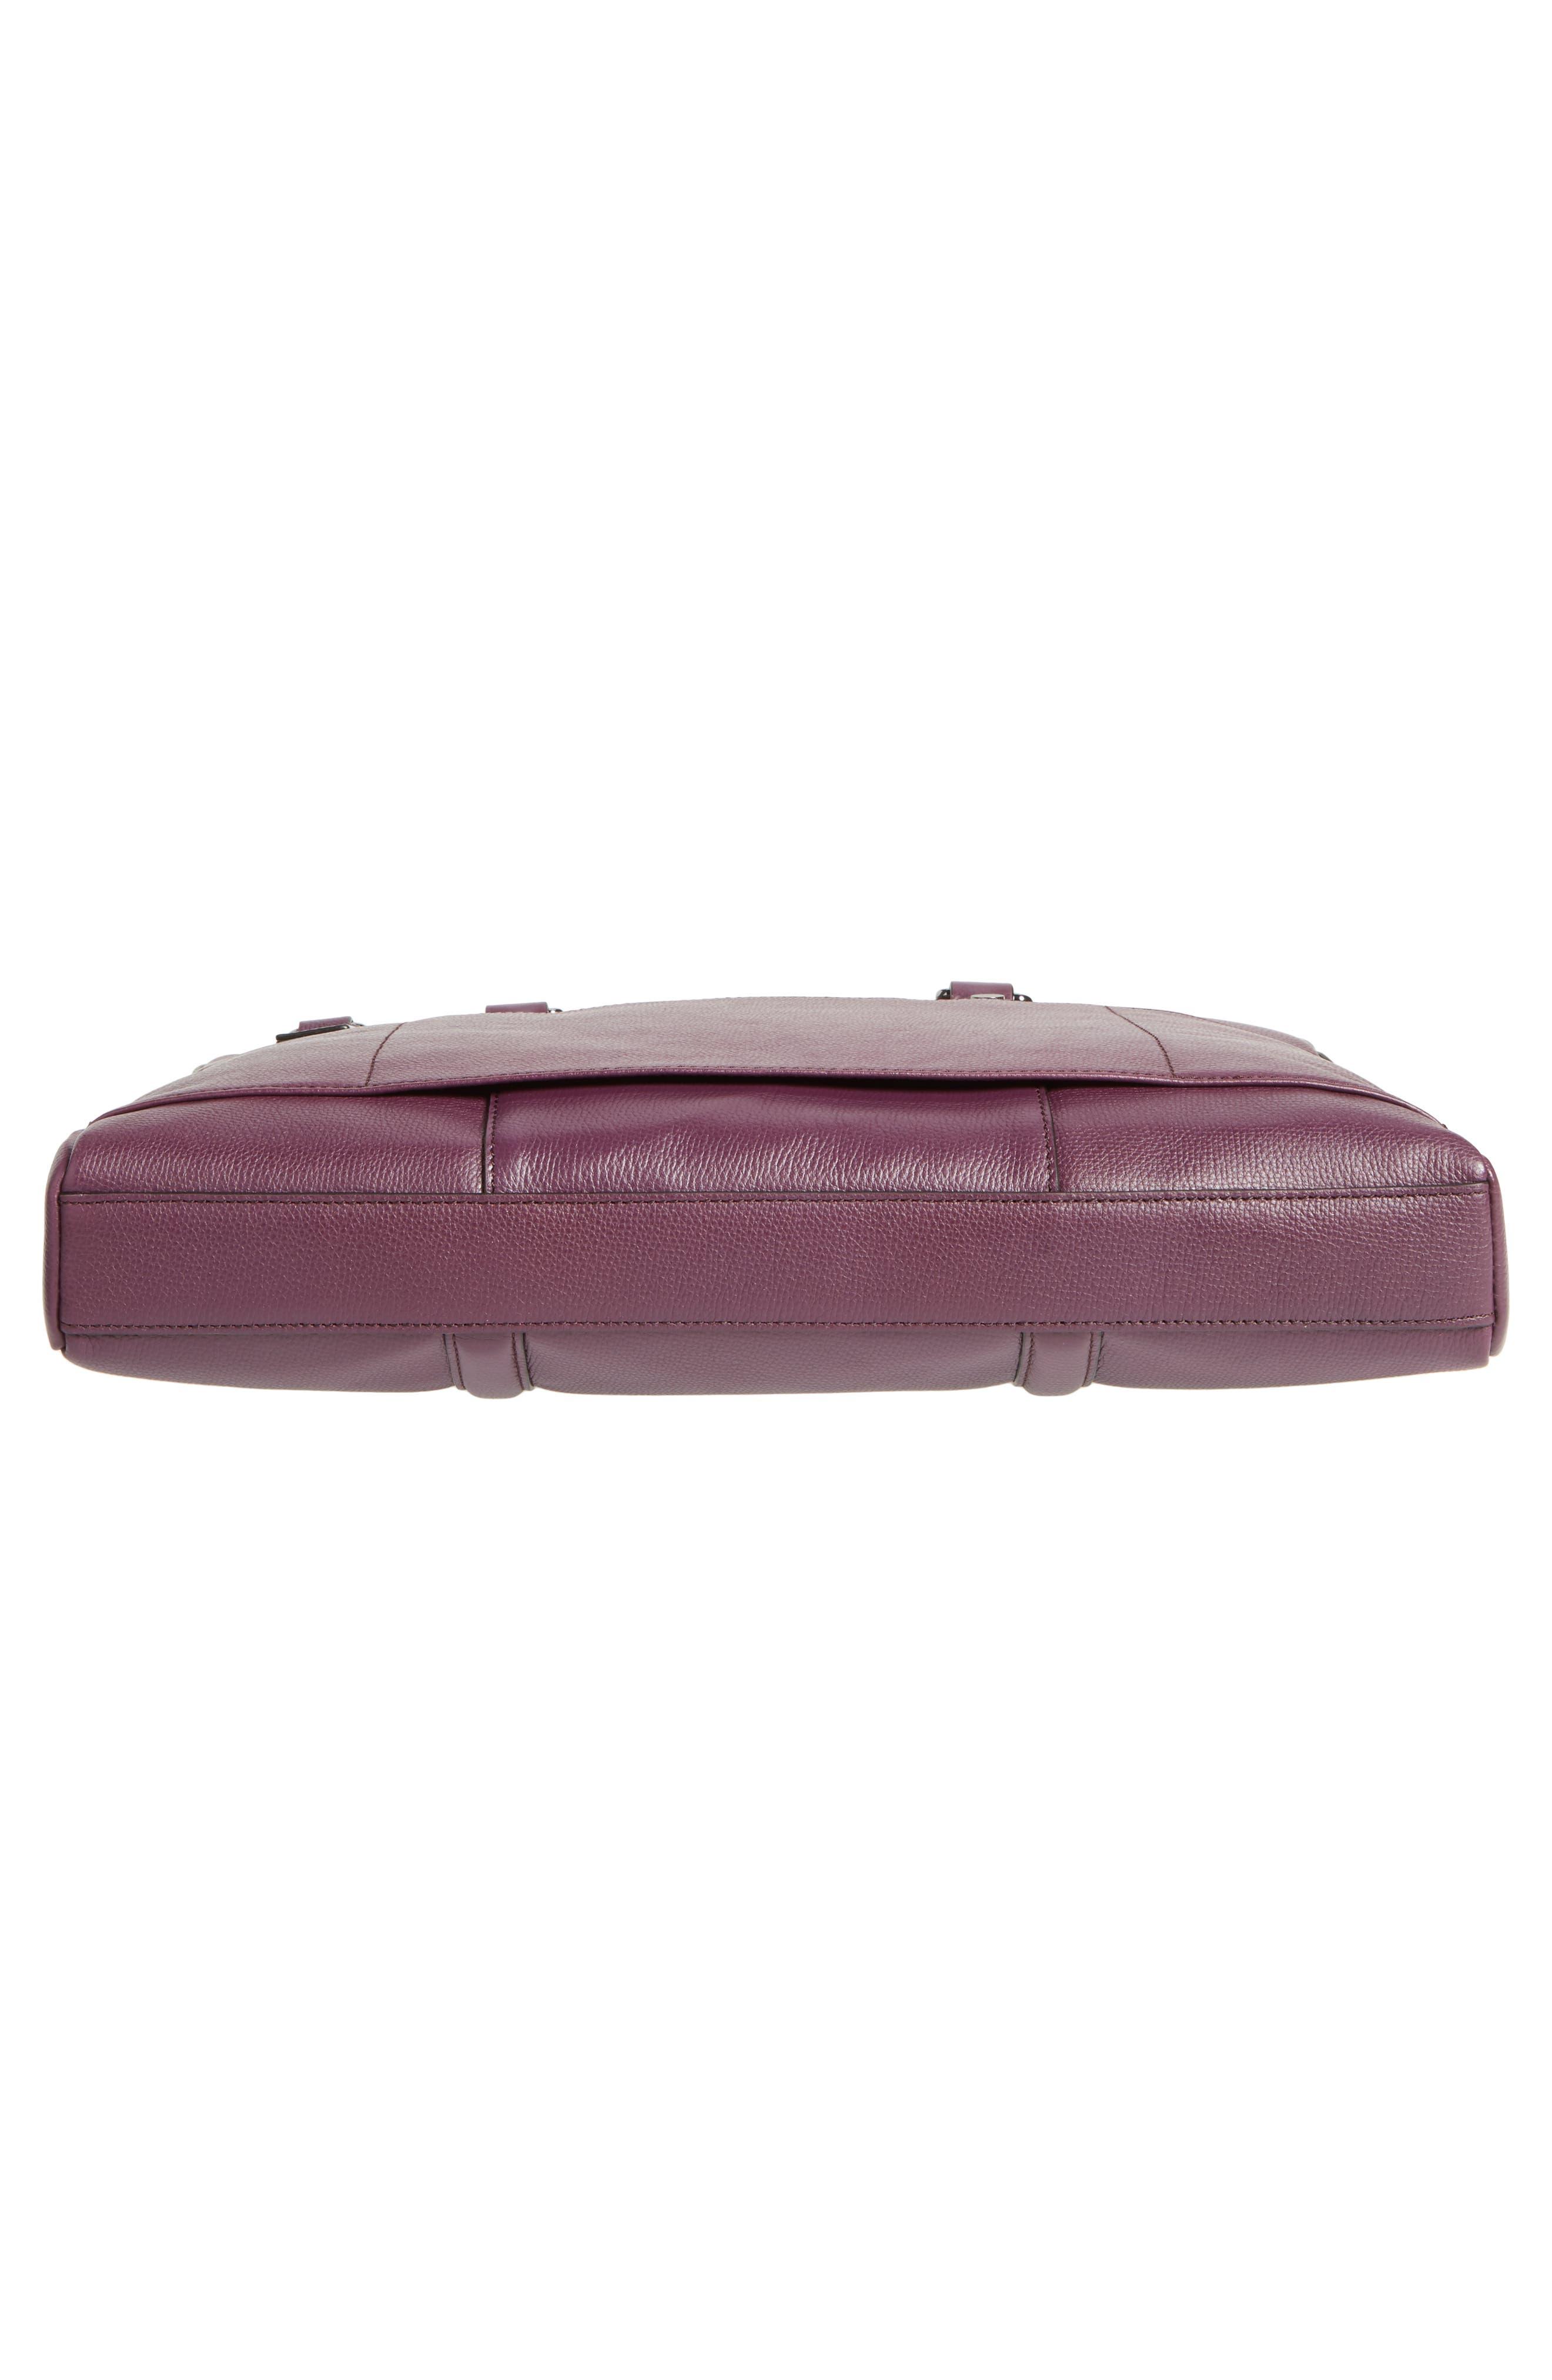 Hoooch Leather Briefcase,                             Alternate thumbnail 6, color,                             DEEP PURPLE